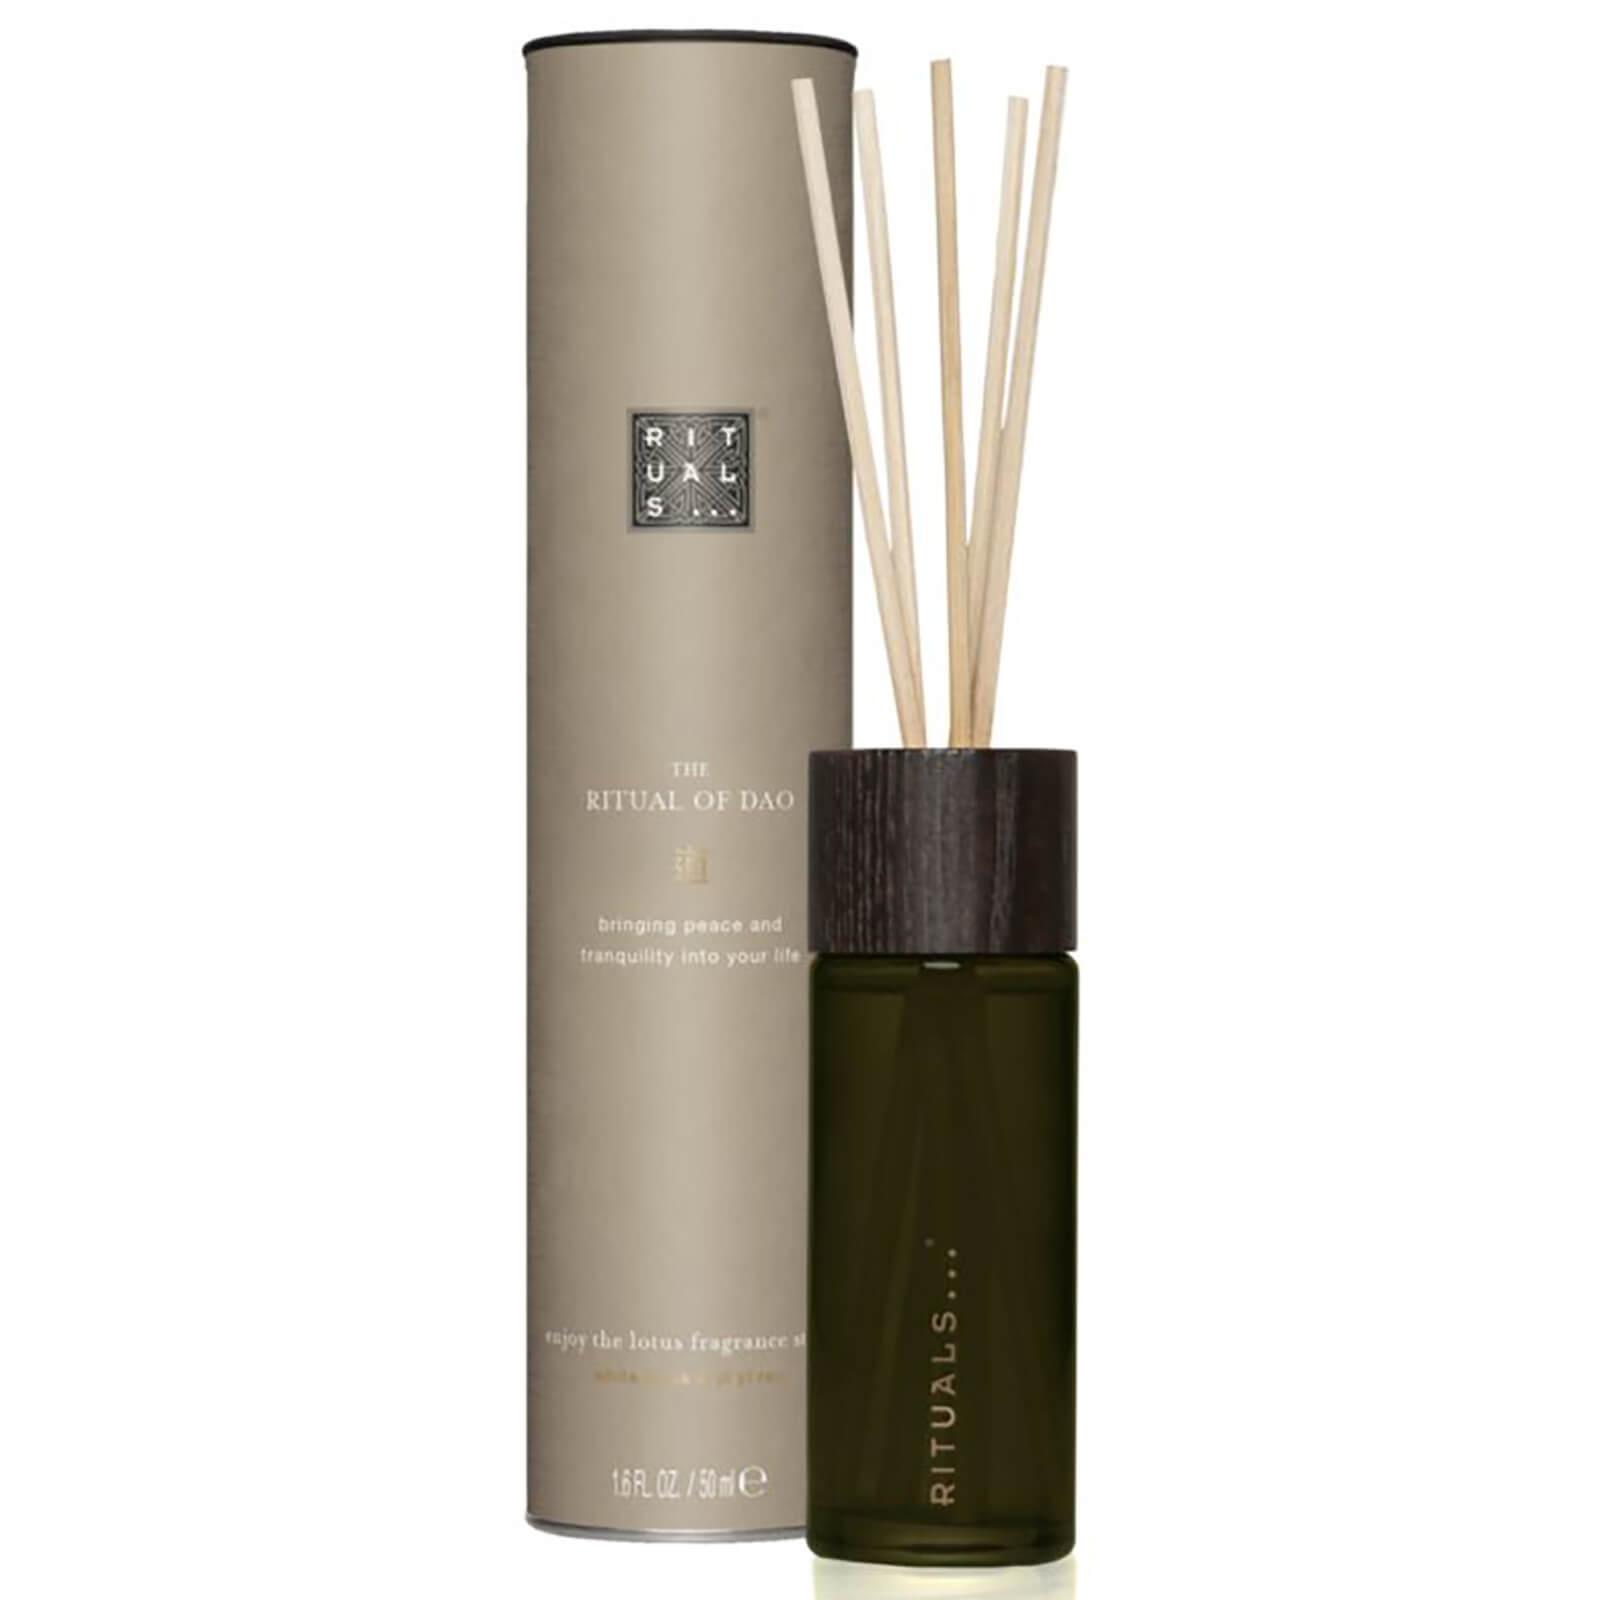 Rituals The Ritual of Dao Mini Fragrance Sticks 50ml